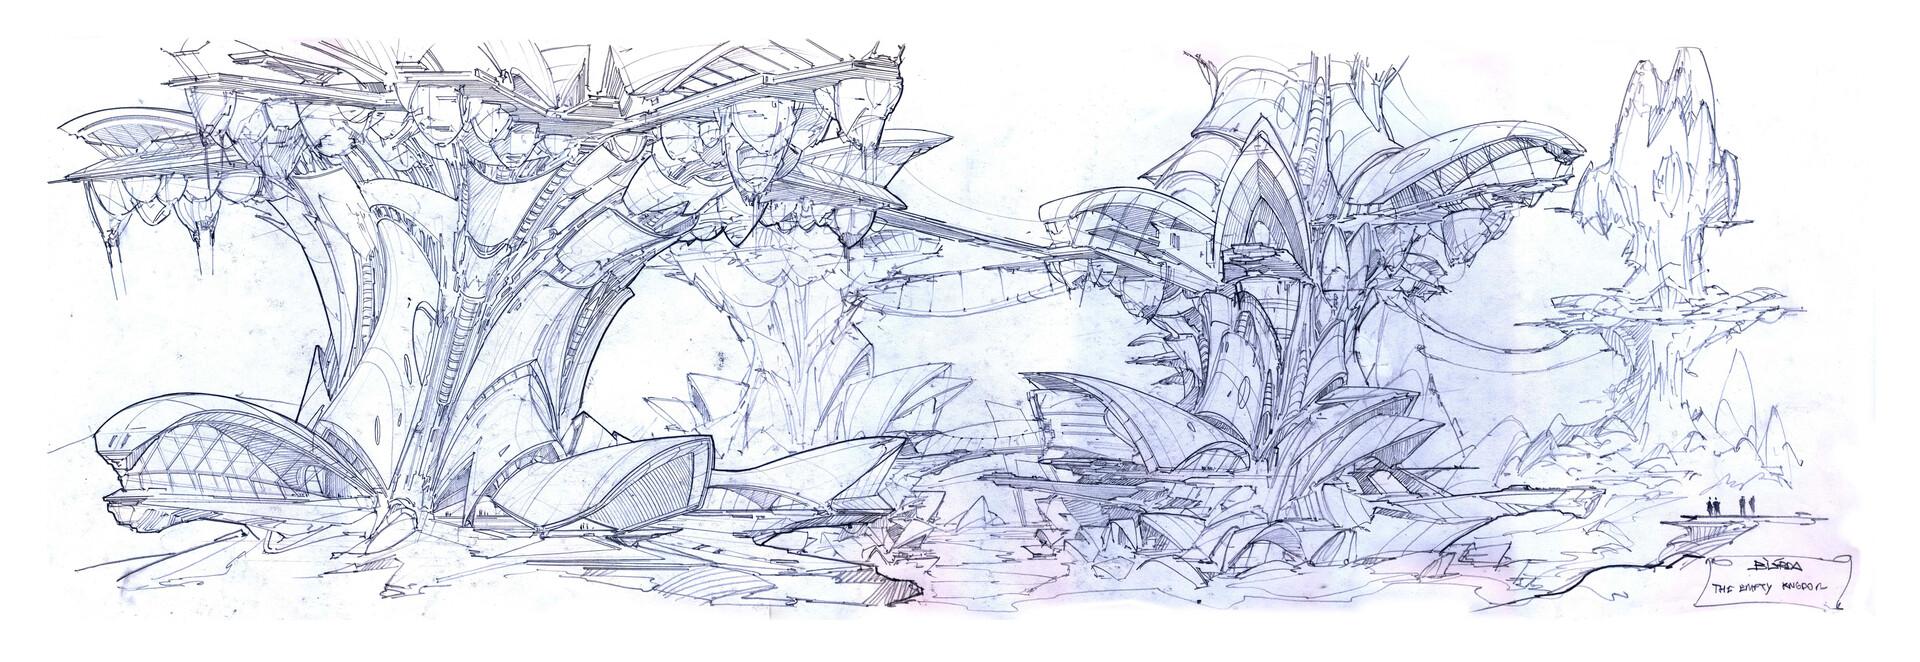 Alejandro burdisio bocetos the empty kingdom arcadia3